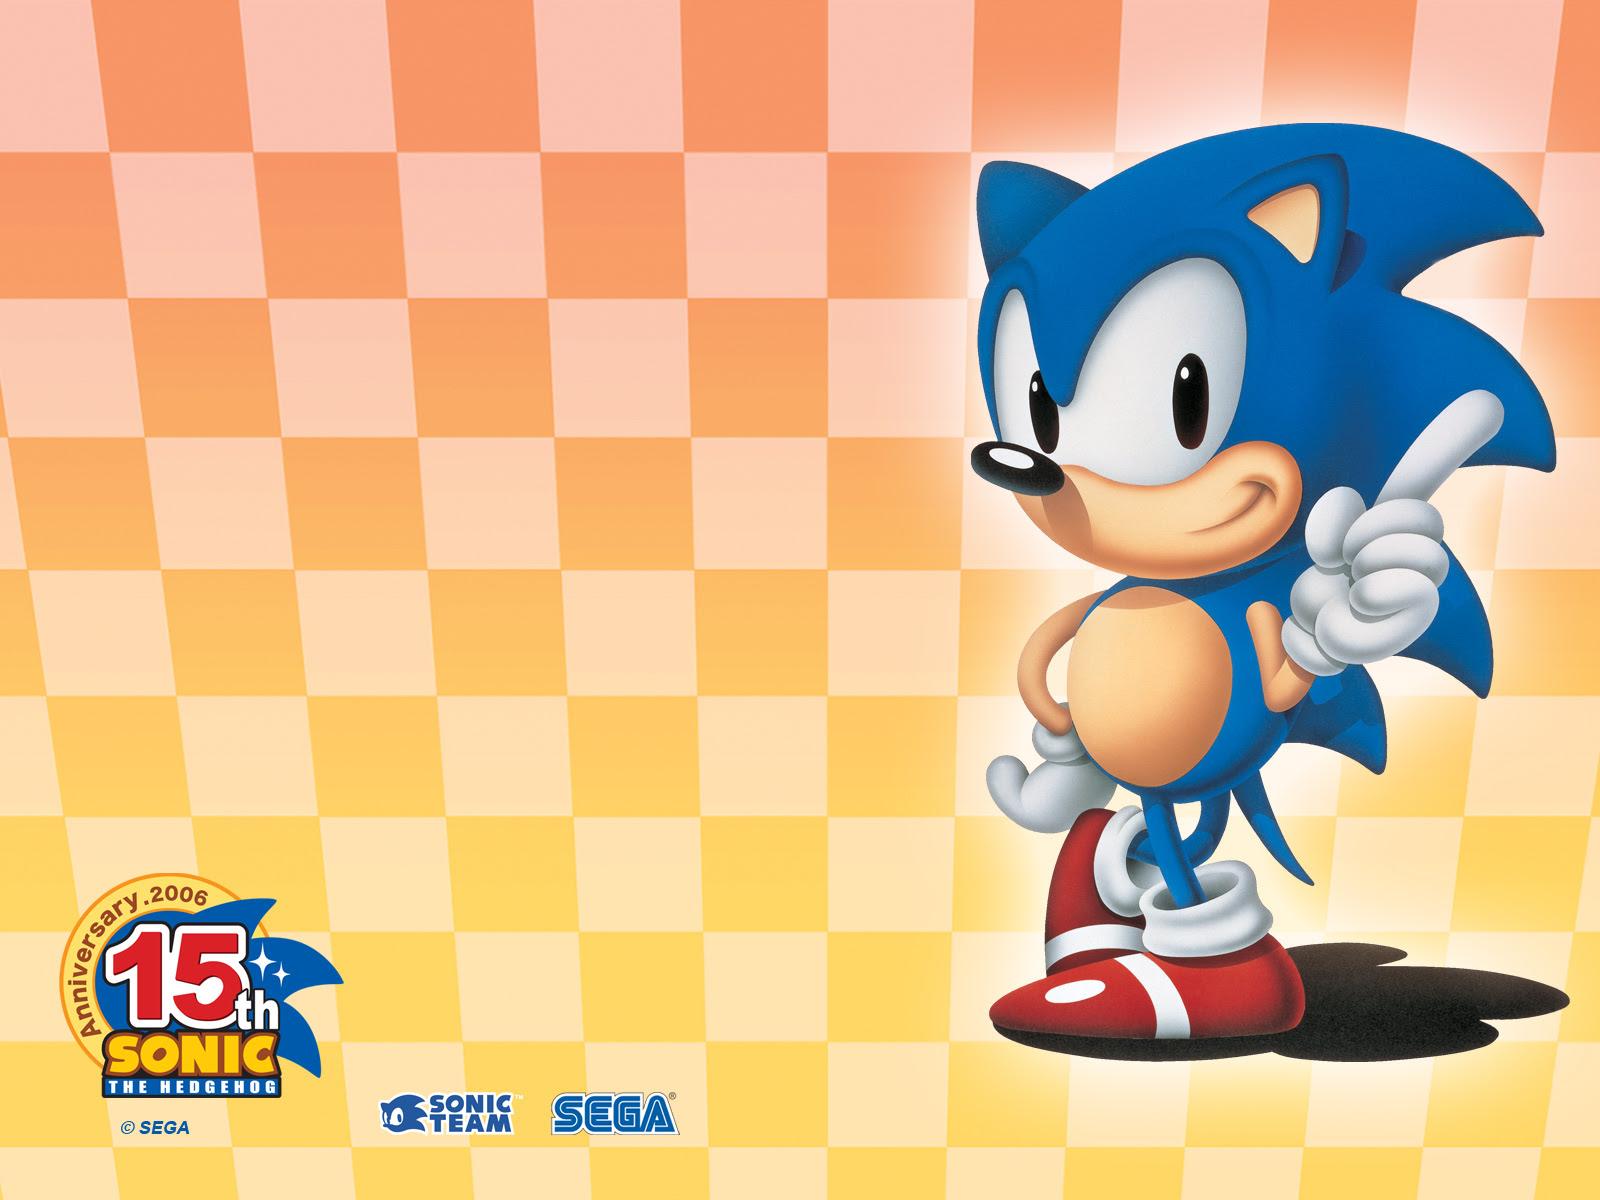 Sonic The Hedgehog Wallpaper 1600x1200 67870